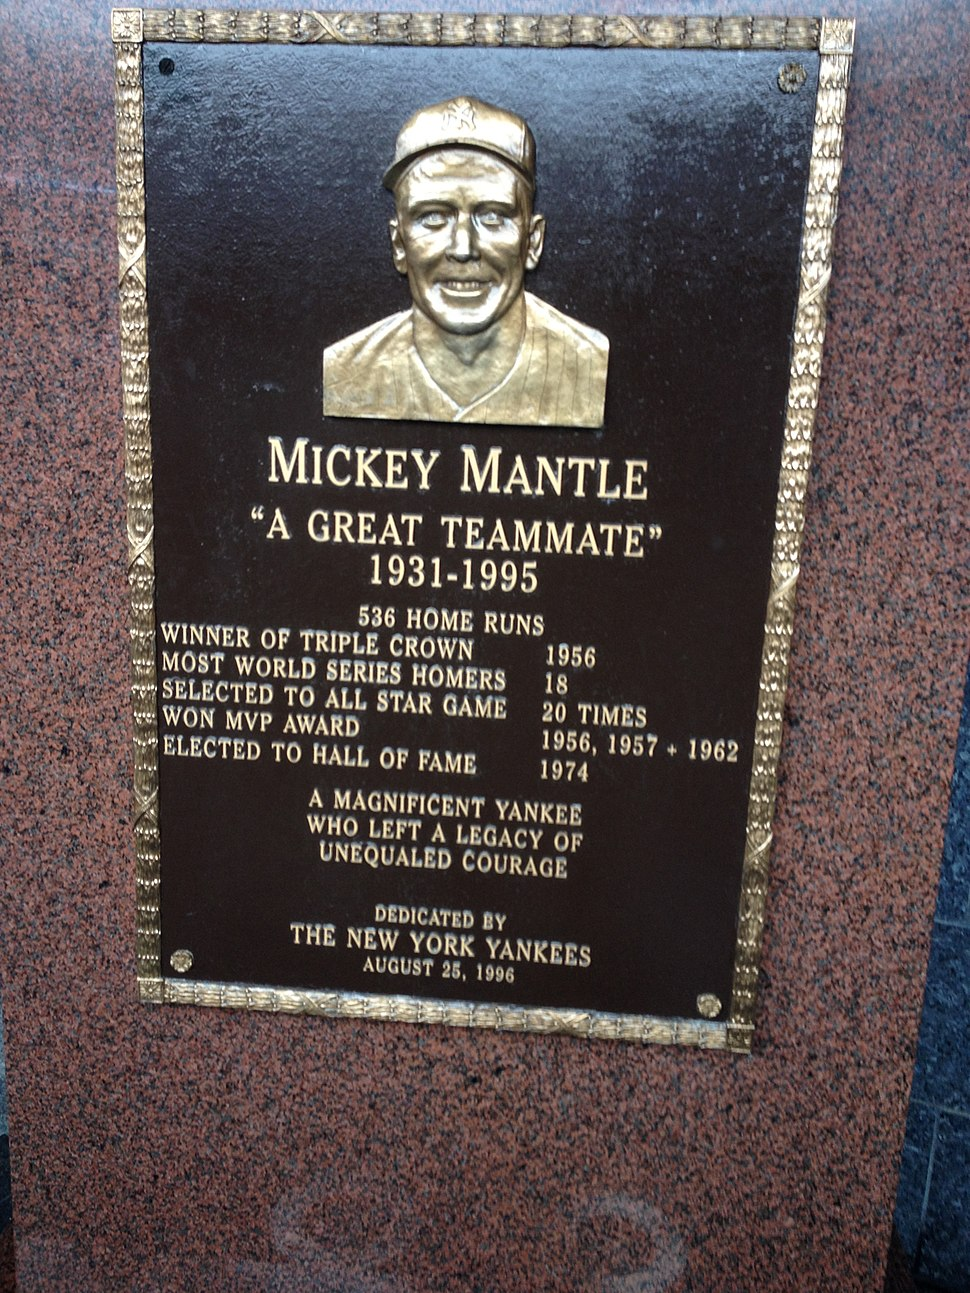 Mickey Mantle's plaque in Yankee Stadium's Monument Park